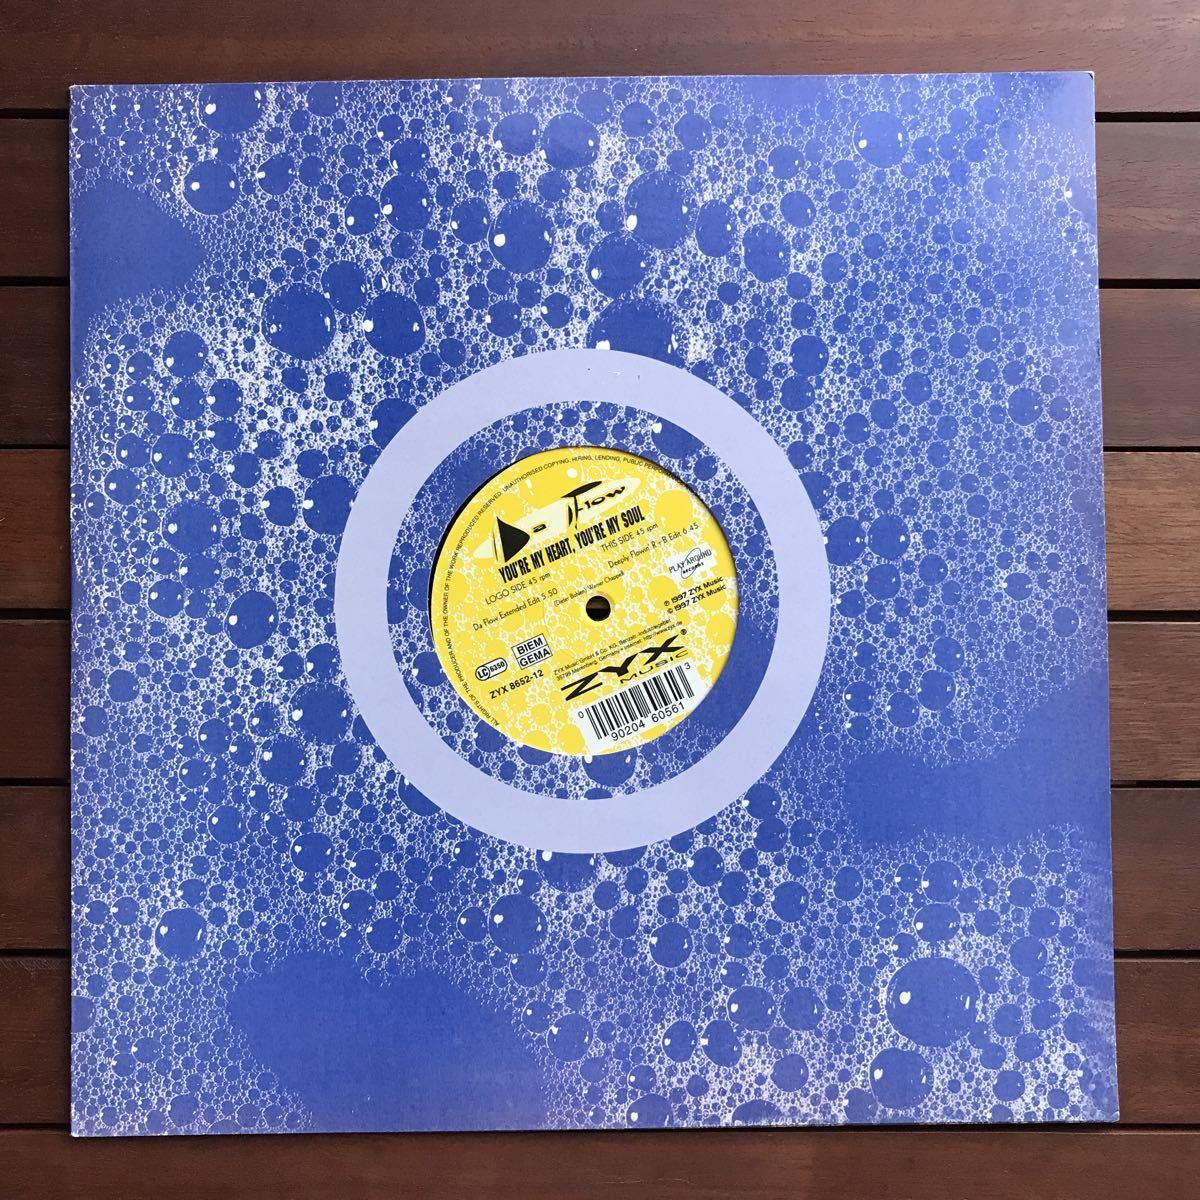 【eu-rap】Da Flow / You're My Heart, You're My Soul[12inch]オリジナル盤《1-4》